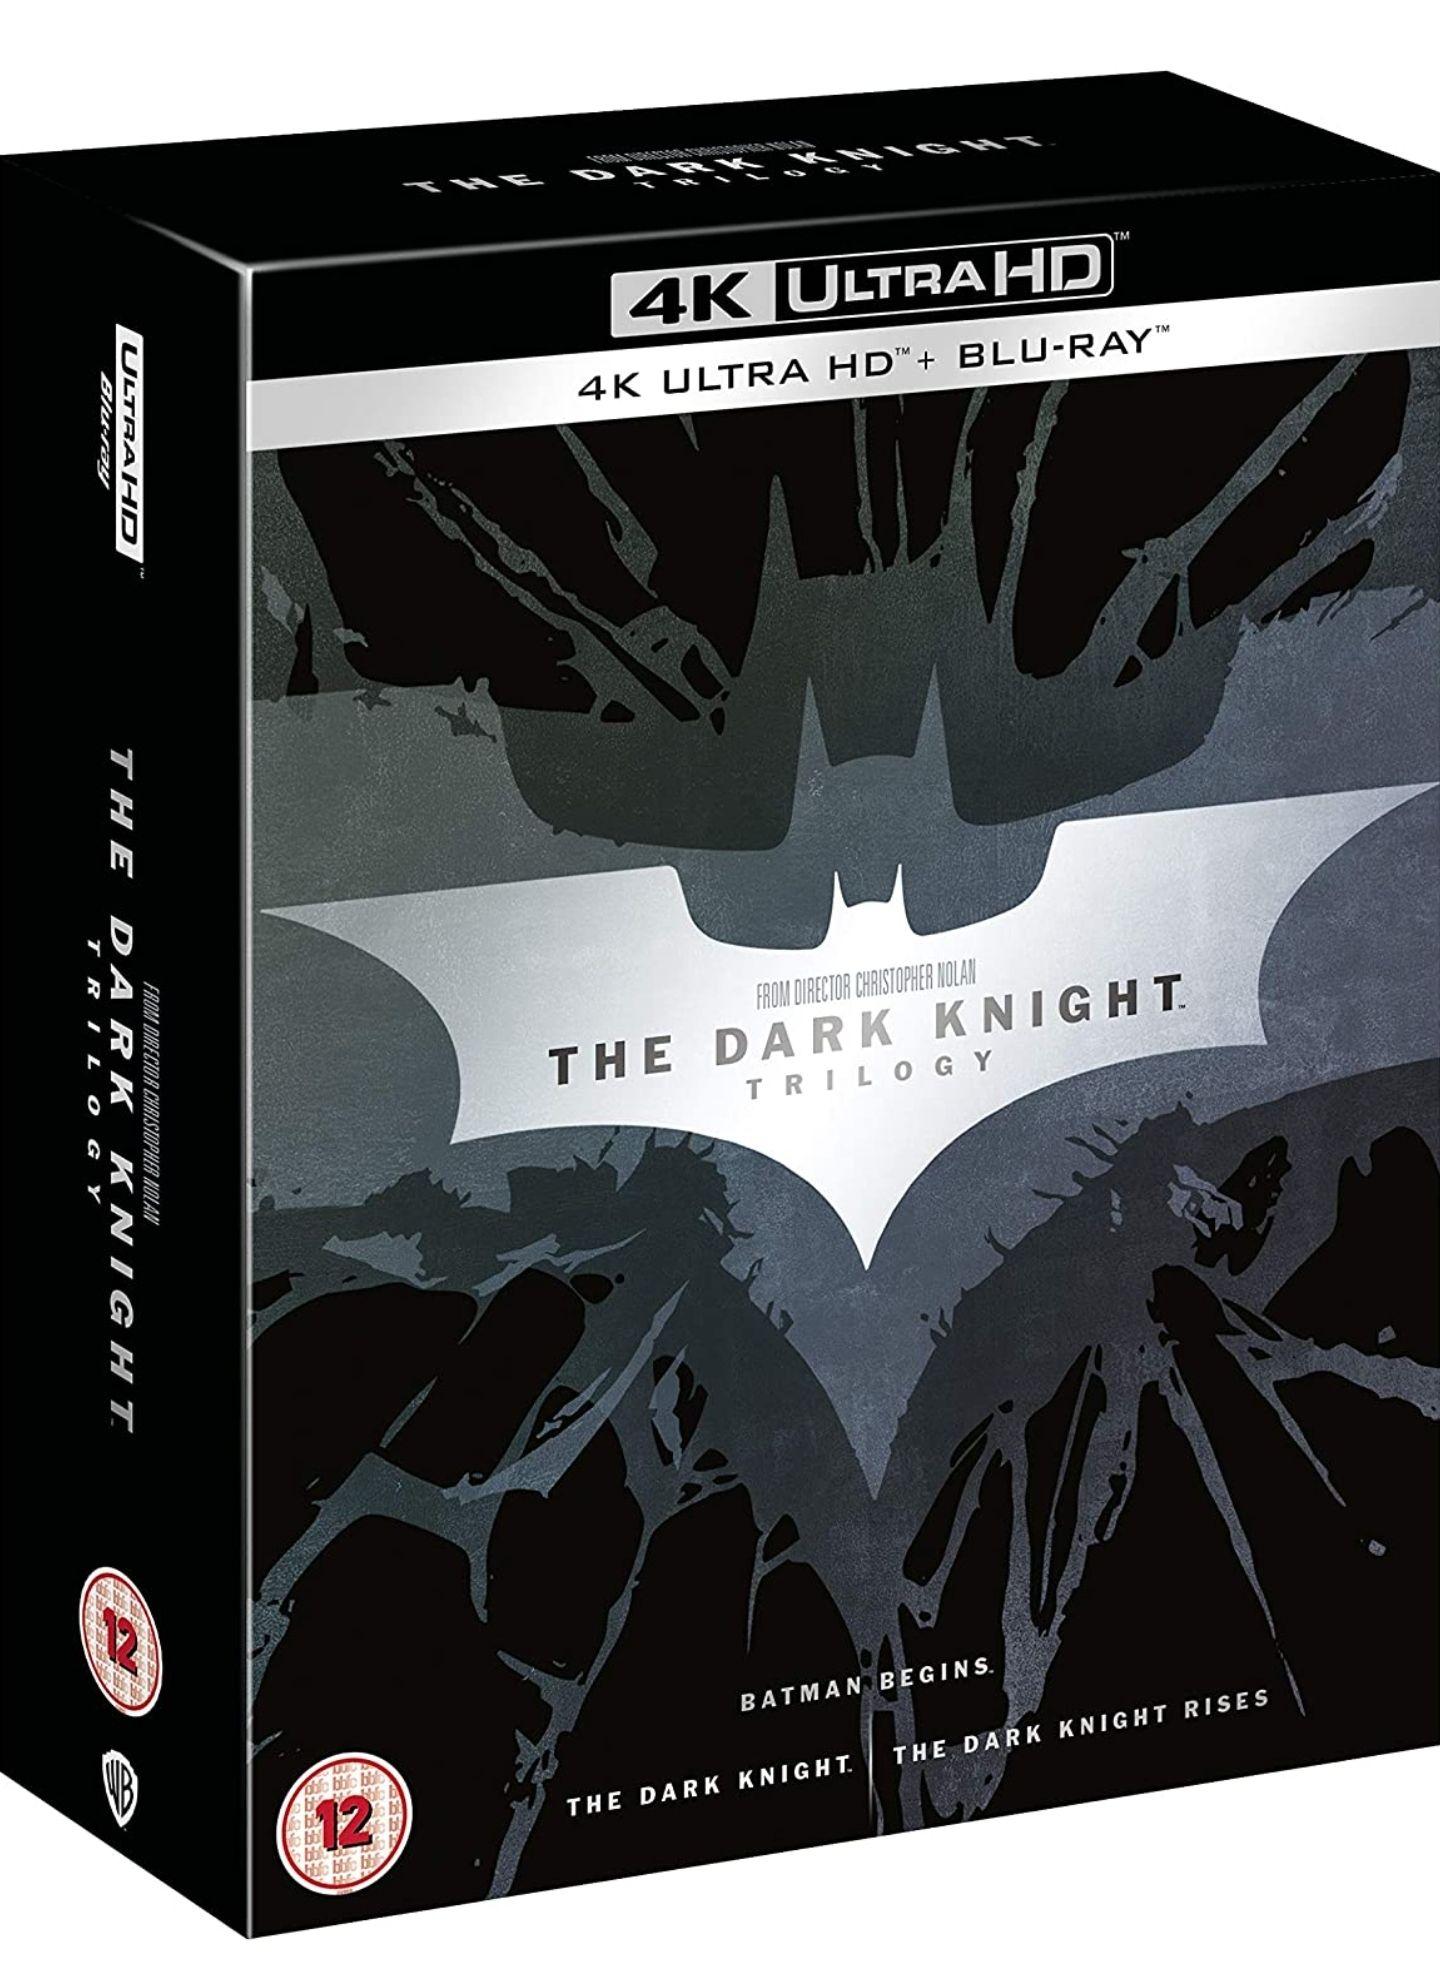 The Dark Knight Trilogy [Batman] [4K Ultra HD] [2012] [Blu-ray] 2017 Edition Boxset £30.40 Amazon